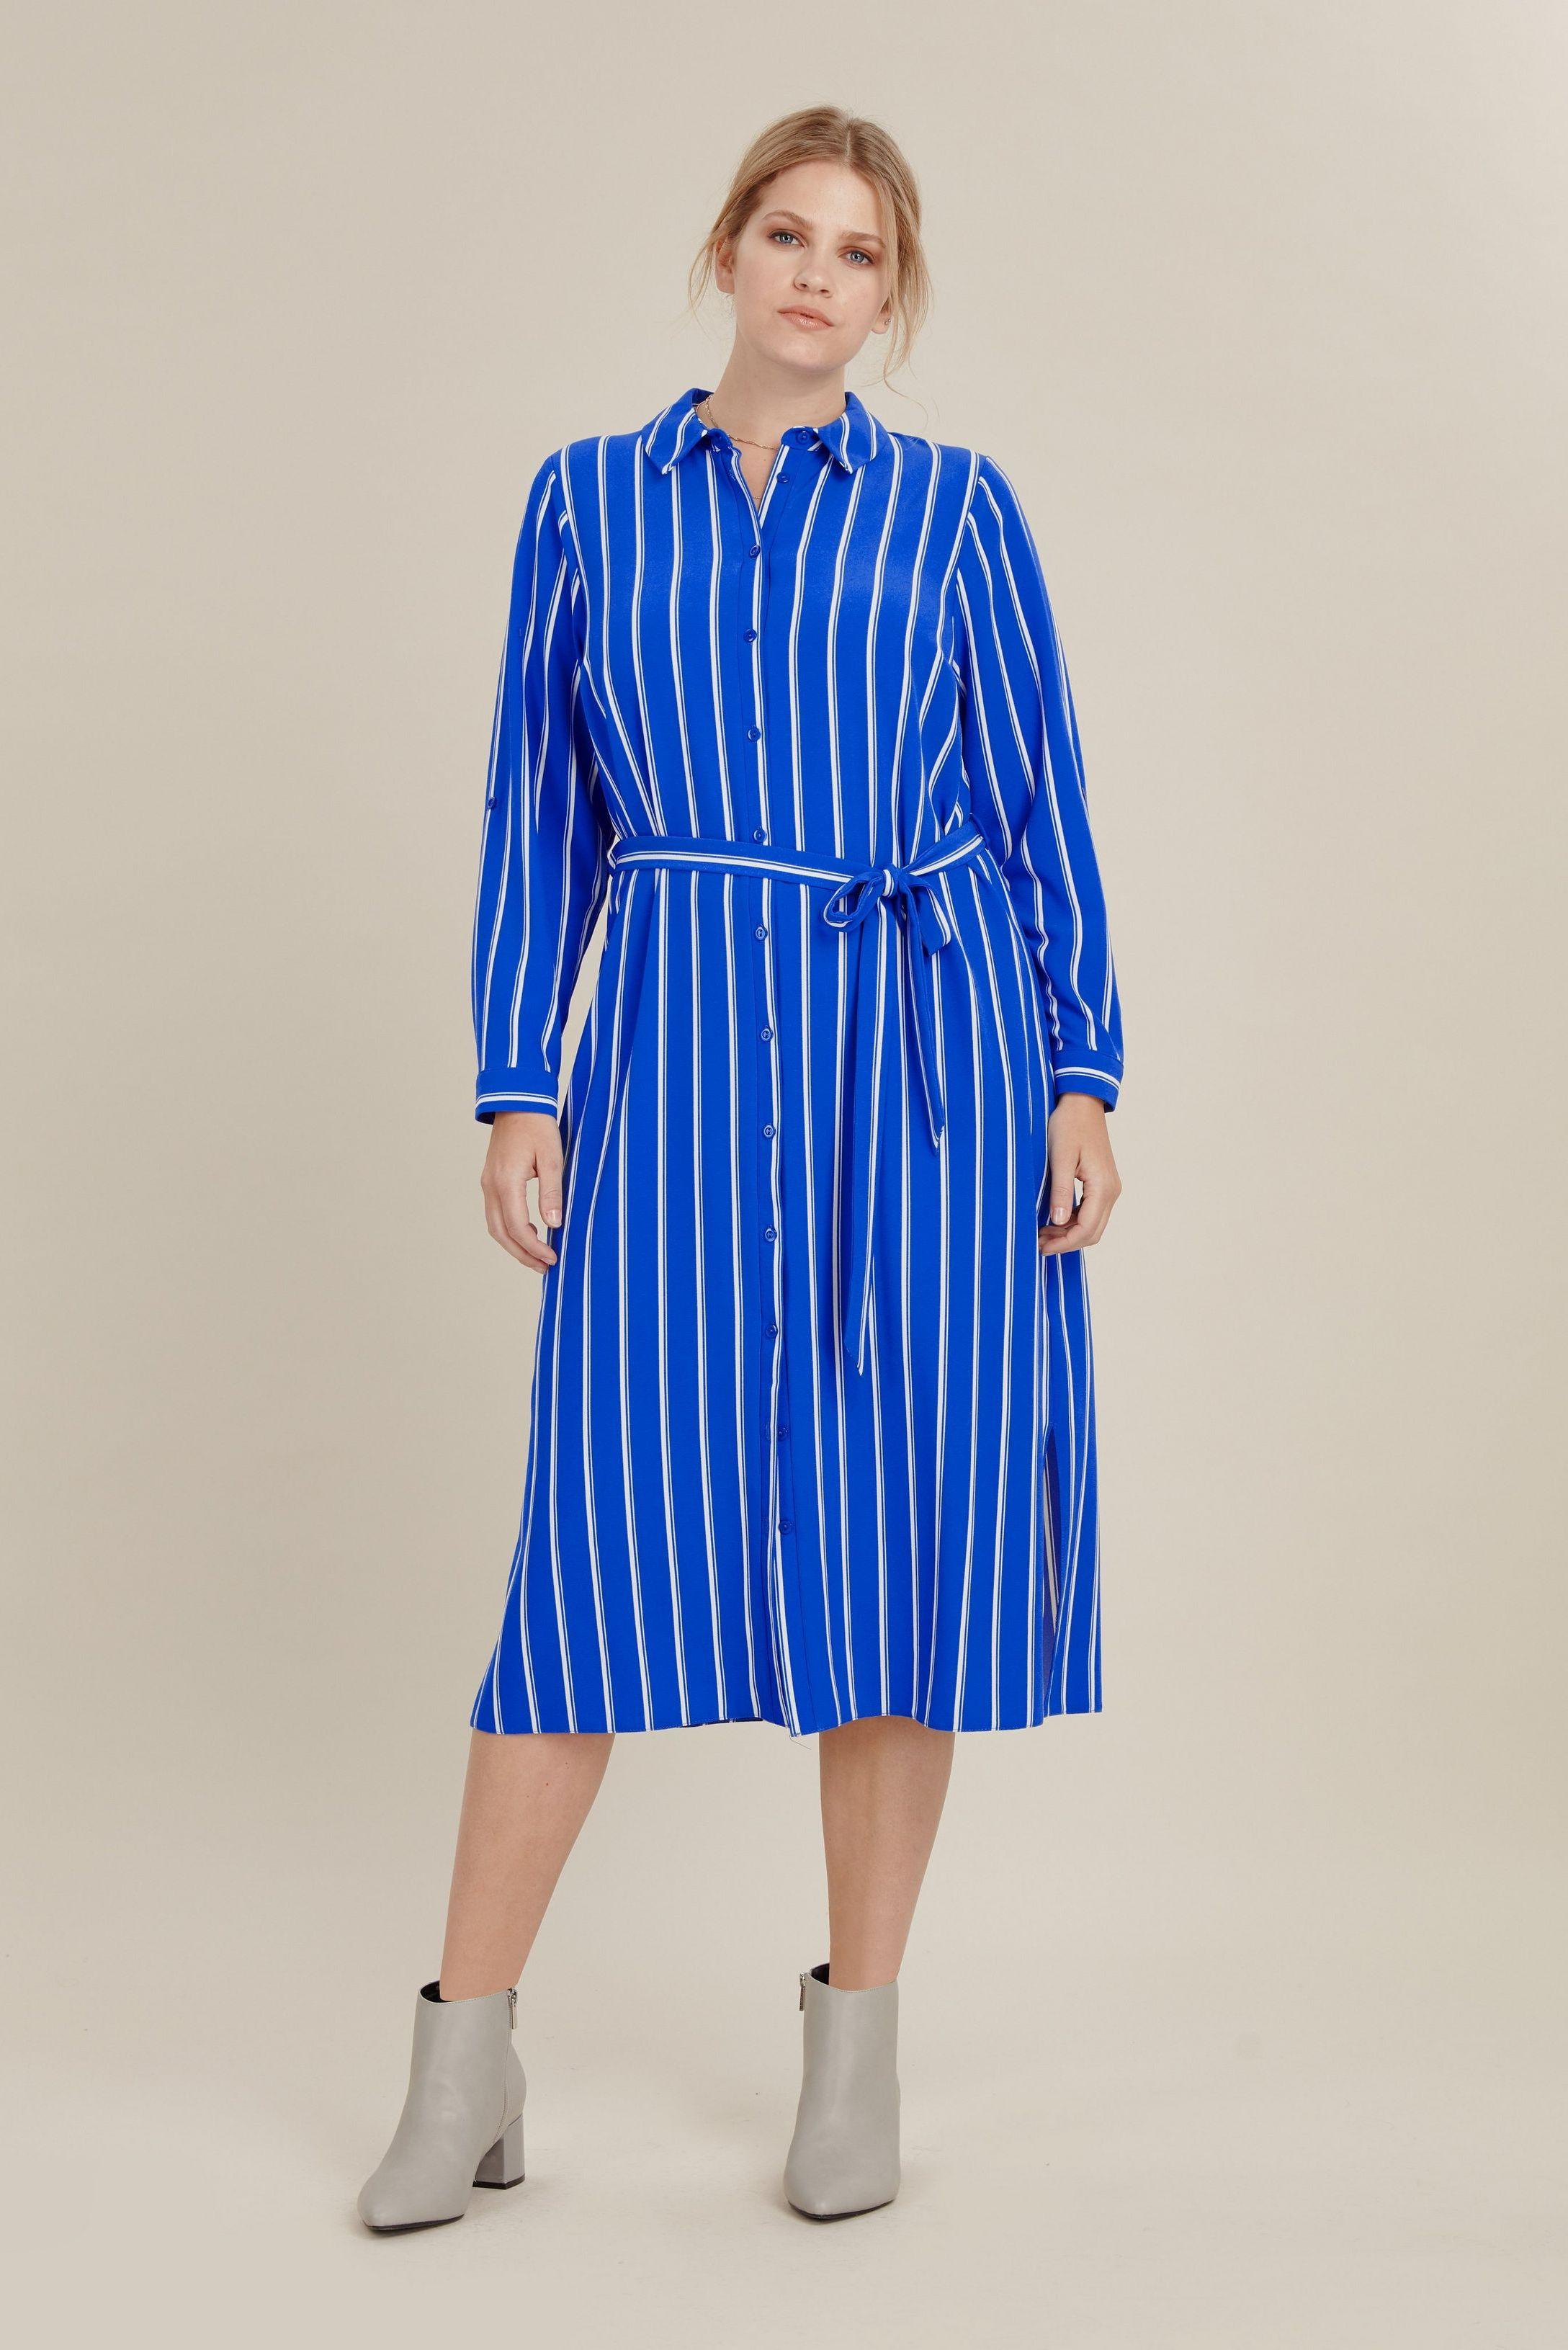 b562d677a3b Lorraine Kelly dresses - Lorraine Kelly wears George at Asda dress